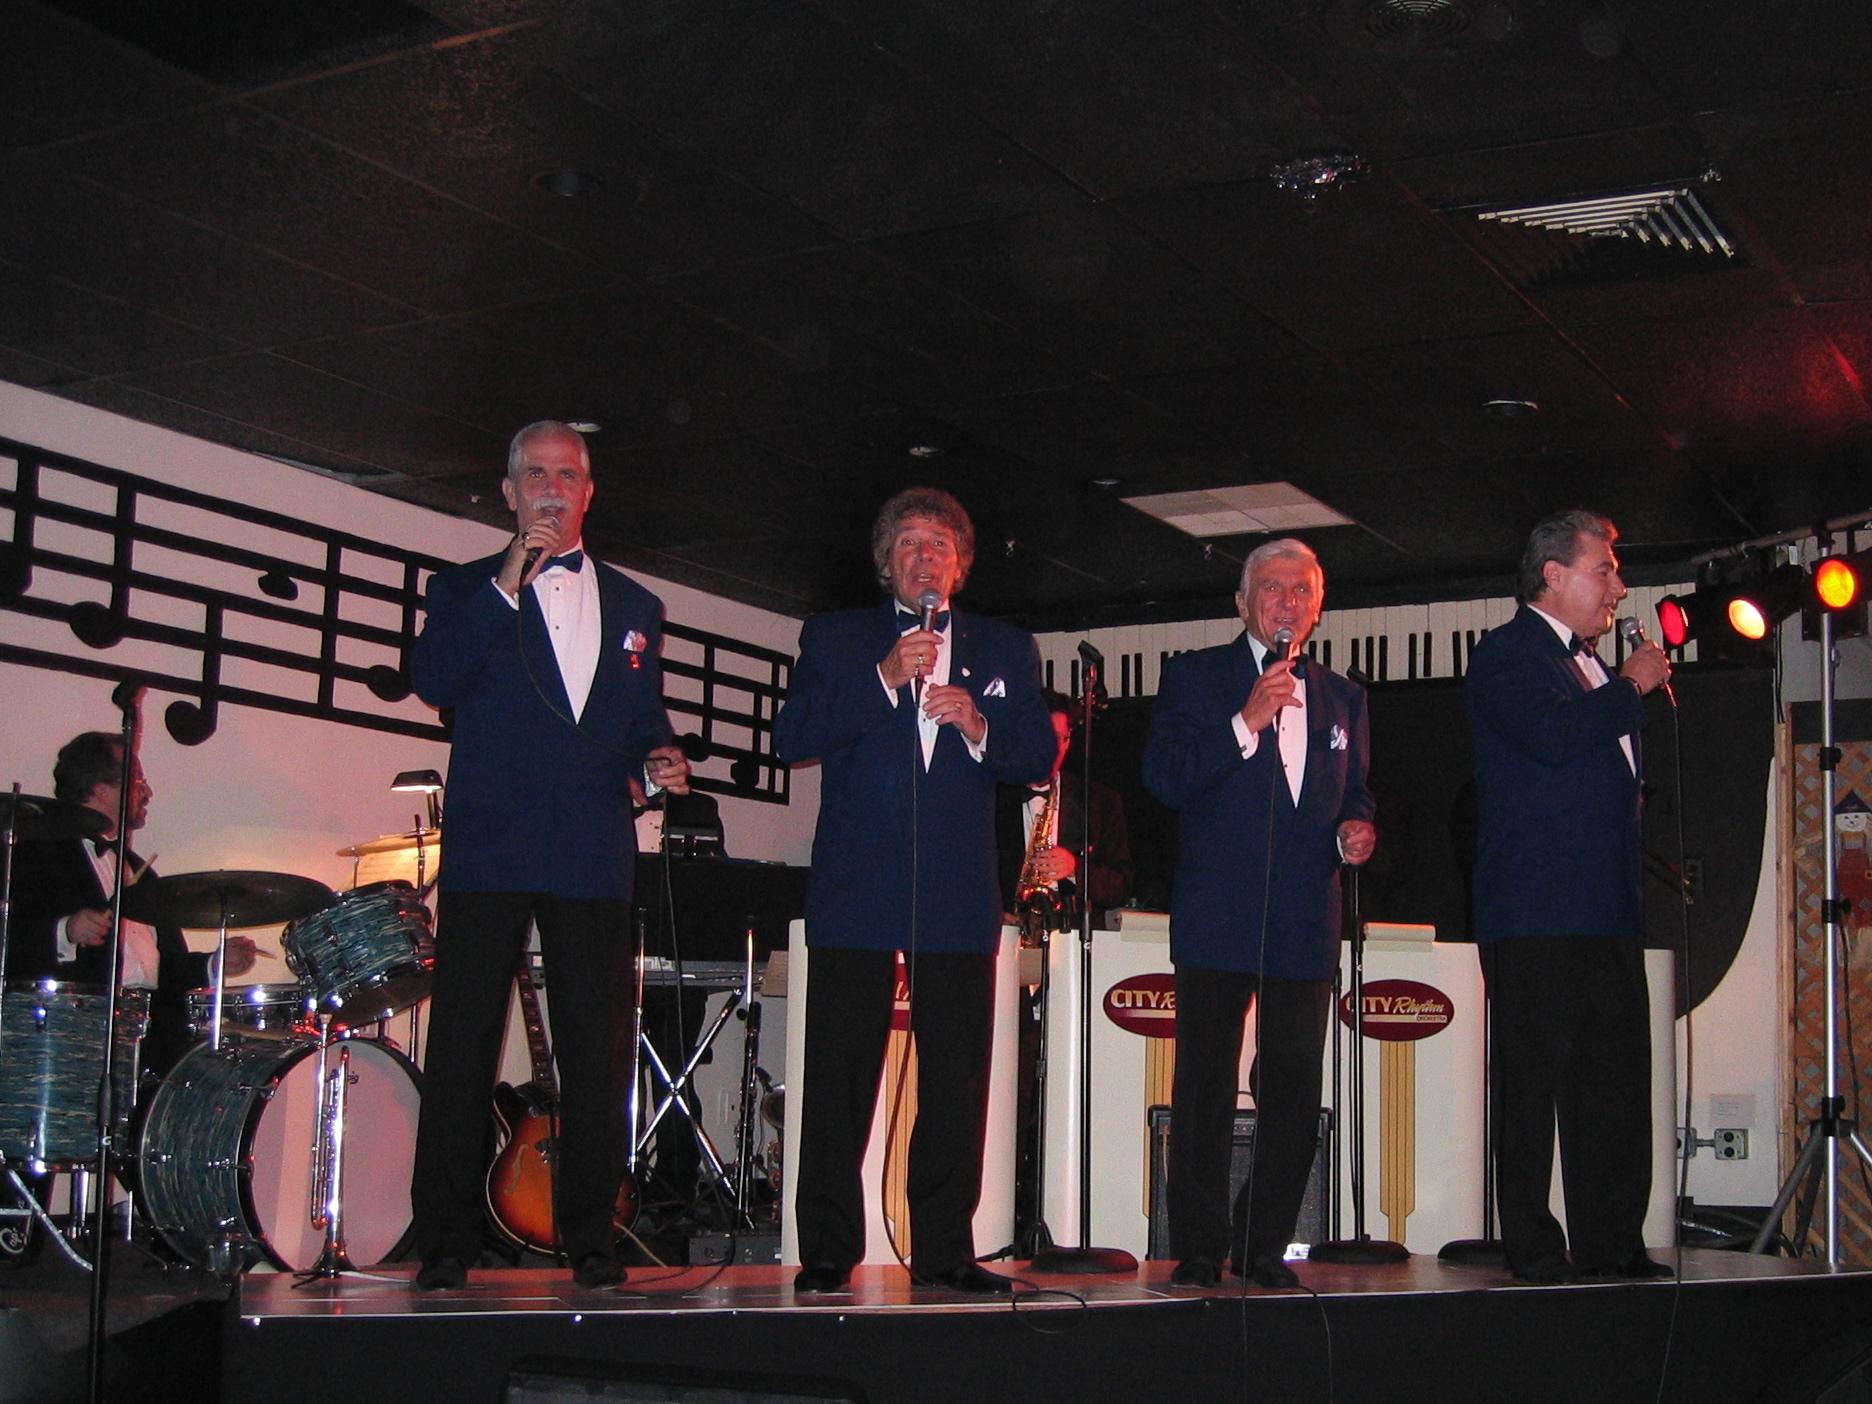 The Four Aces Show